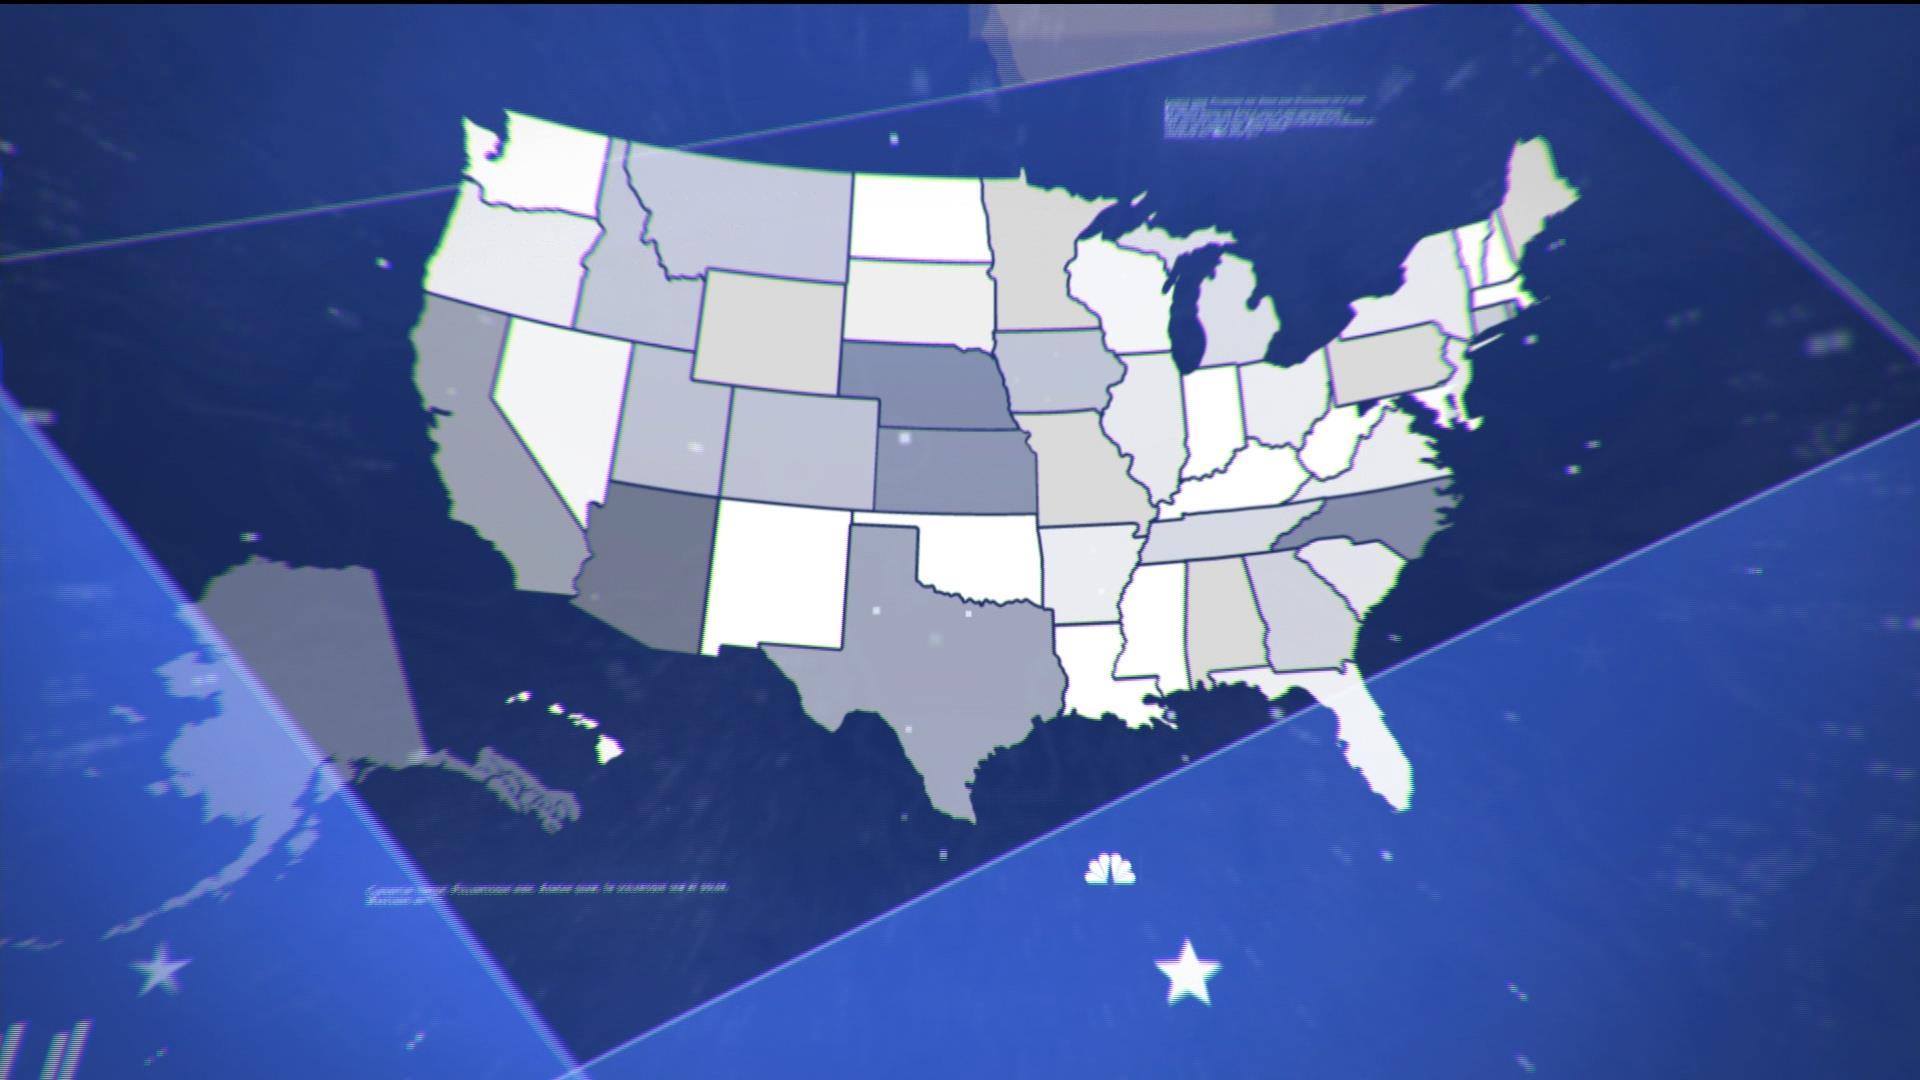 2020 Democrats face 2012 GOP challenges